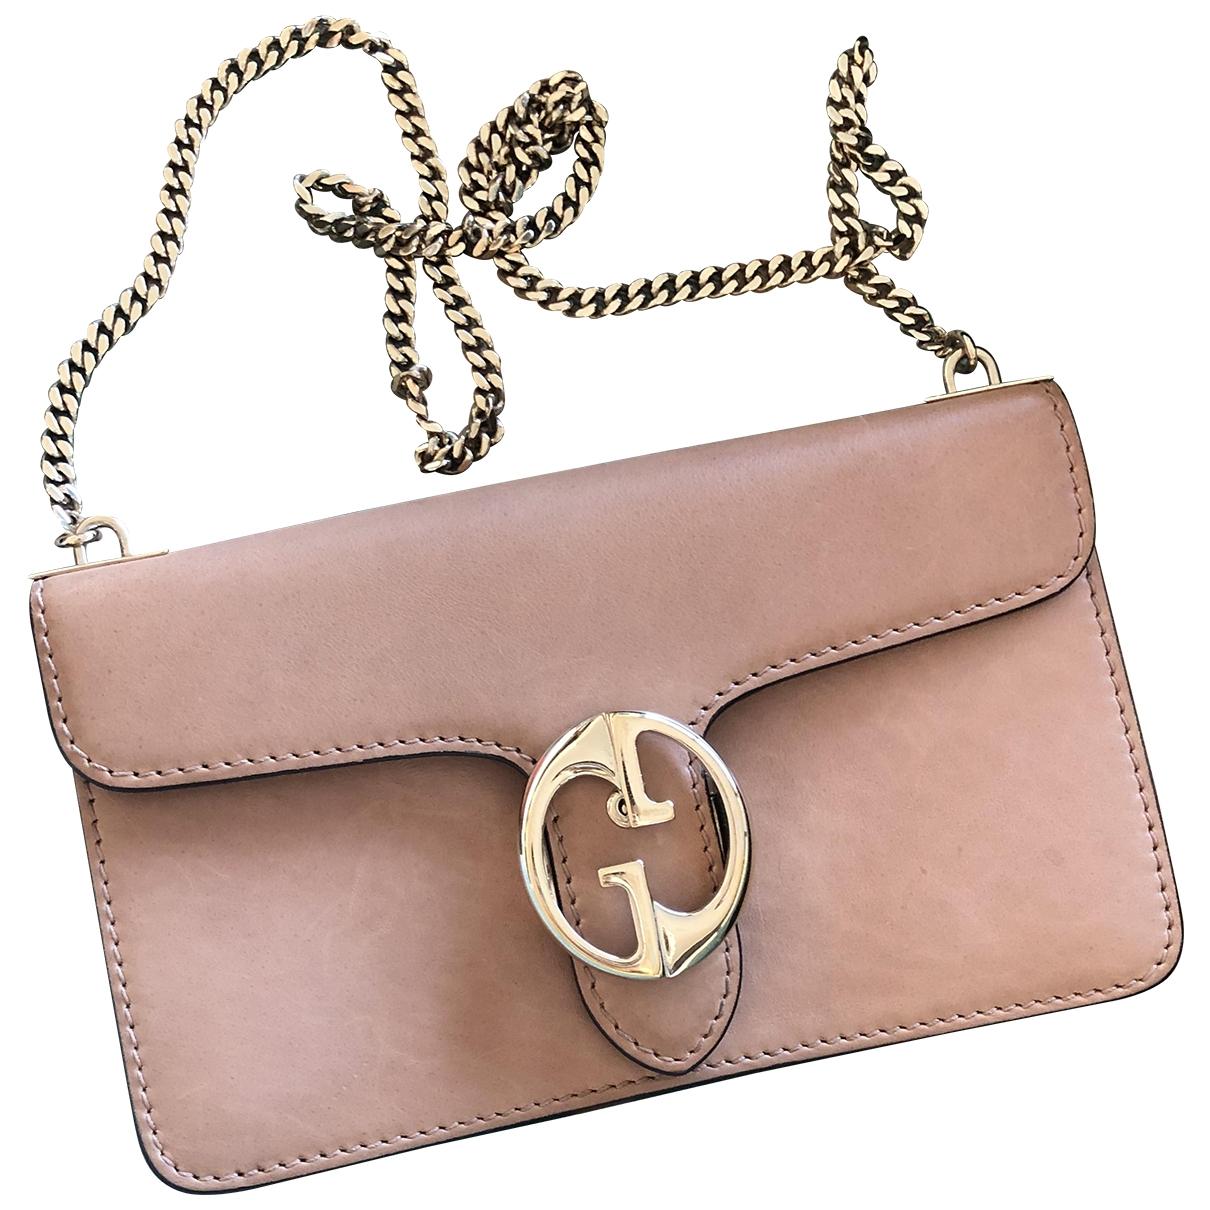 Gucci 1973 Beige Leather handbag for Women \N